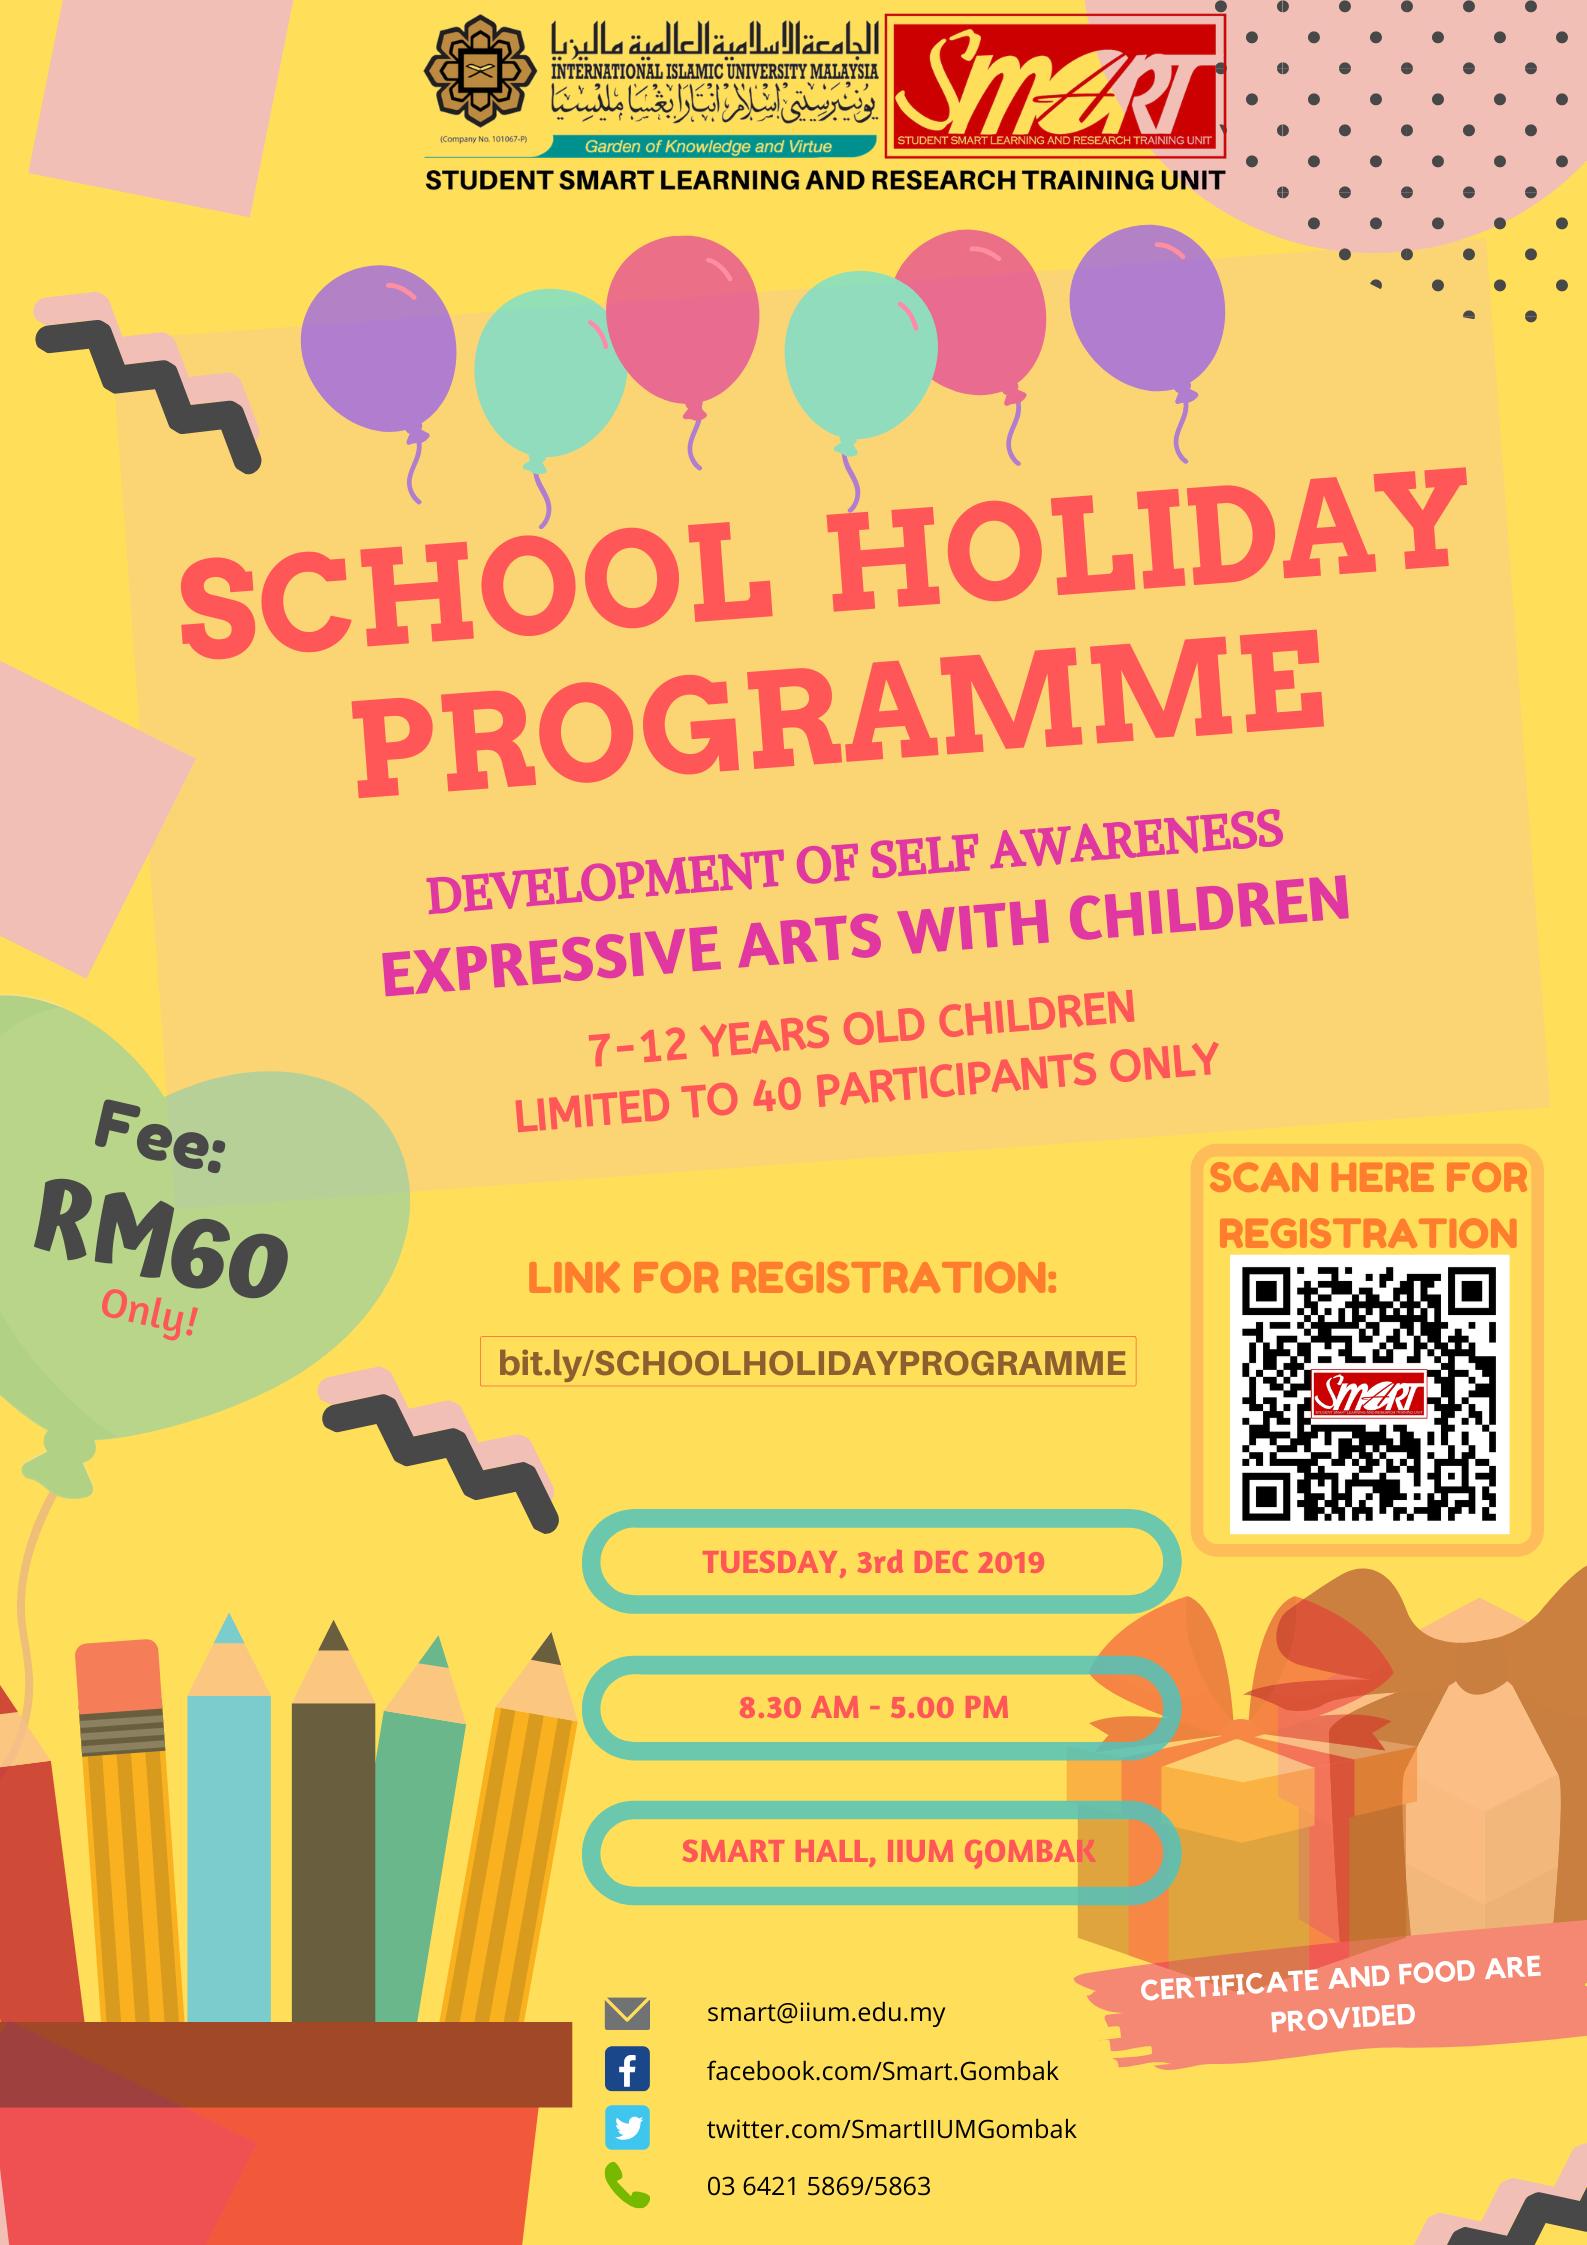 SCHOOL HOLIDAY PROGRAMME 2019